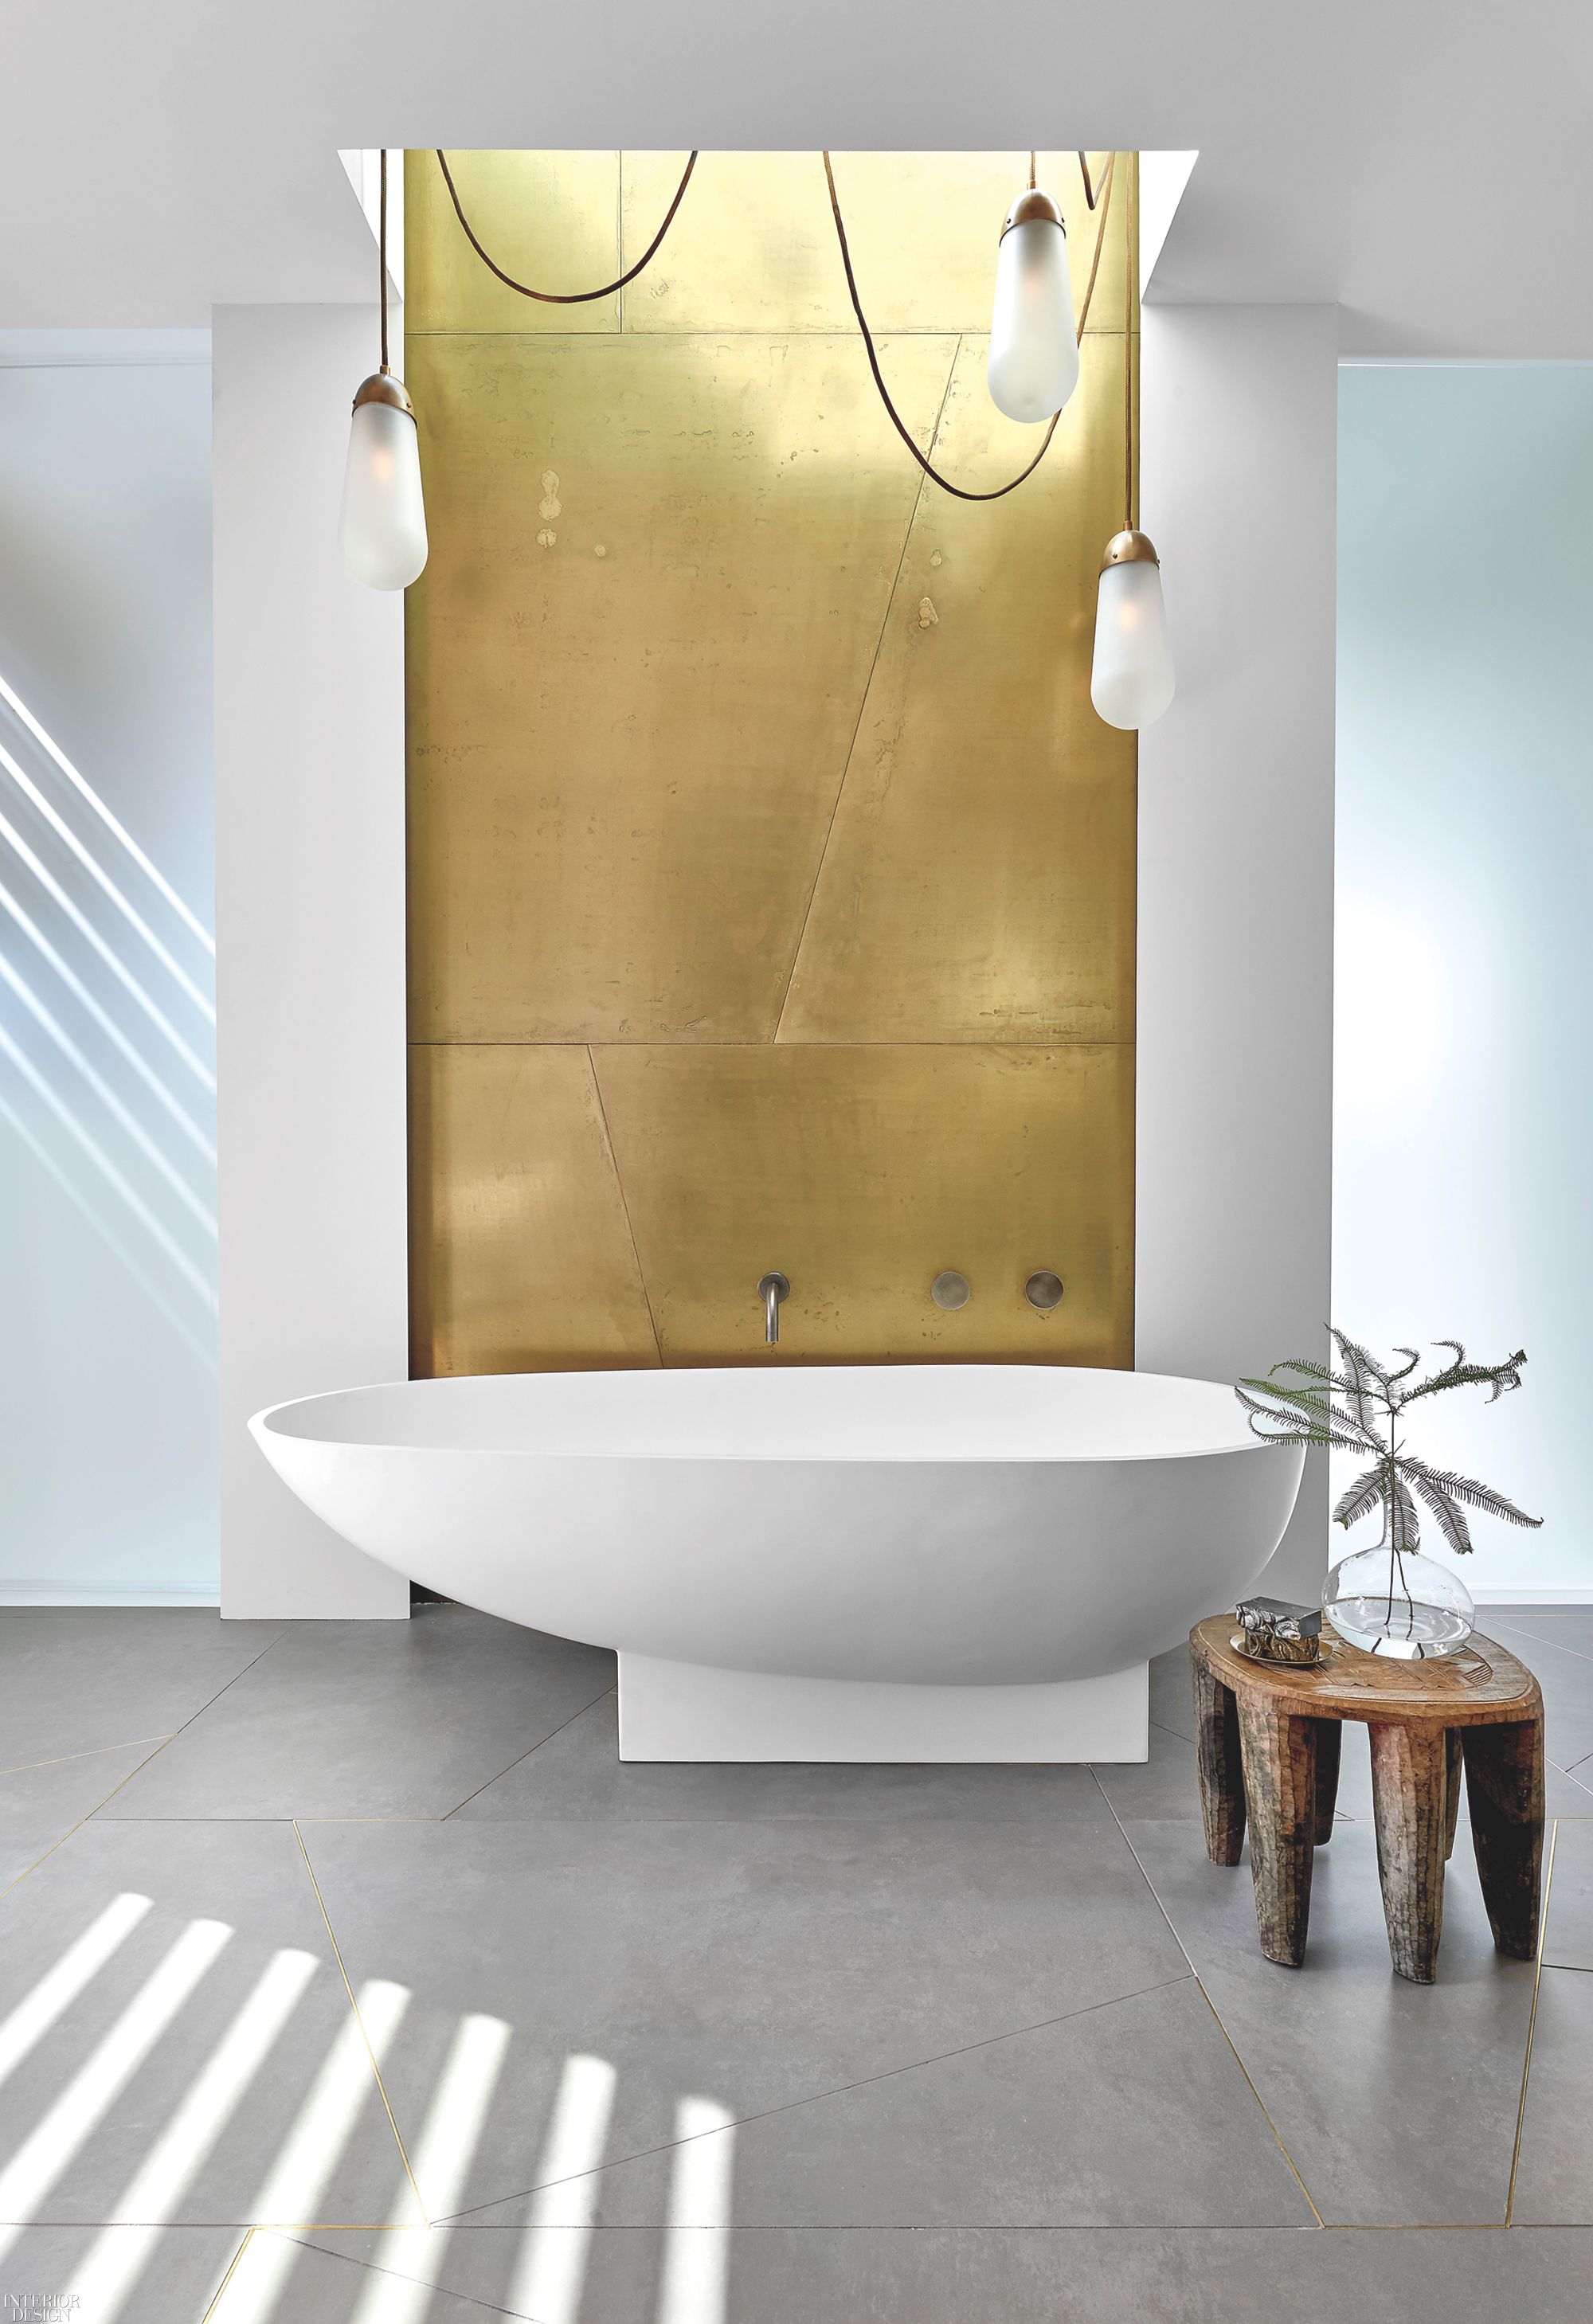 6 Perfectly Tranquil Bathtubs  Interior Design Magazine